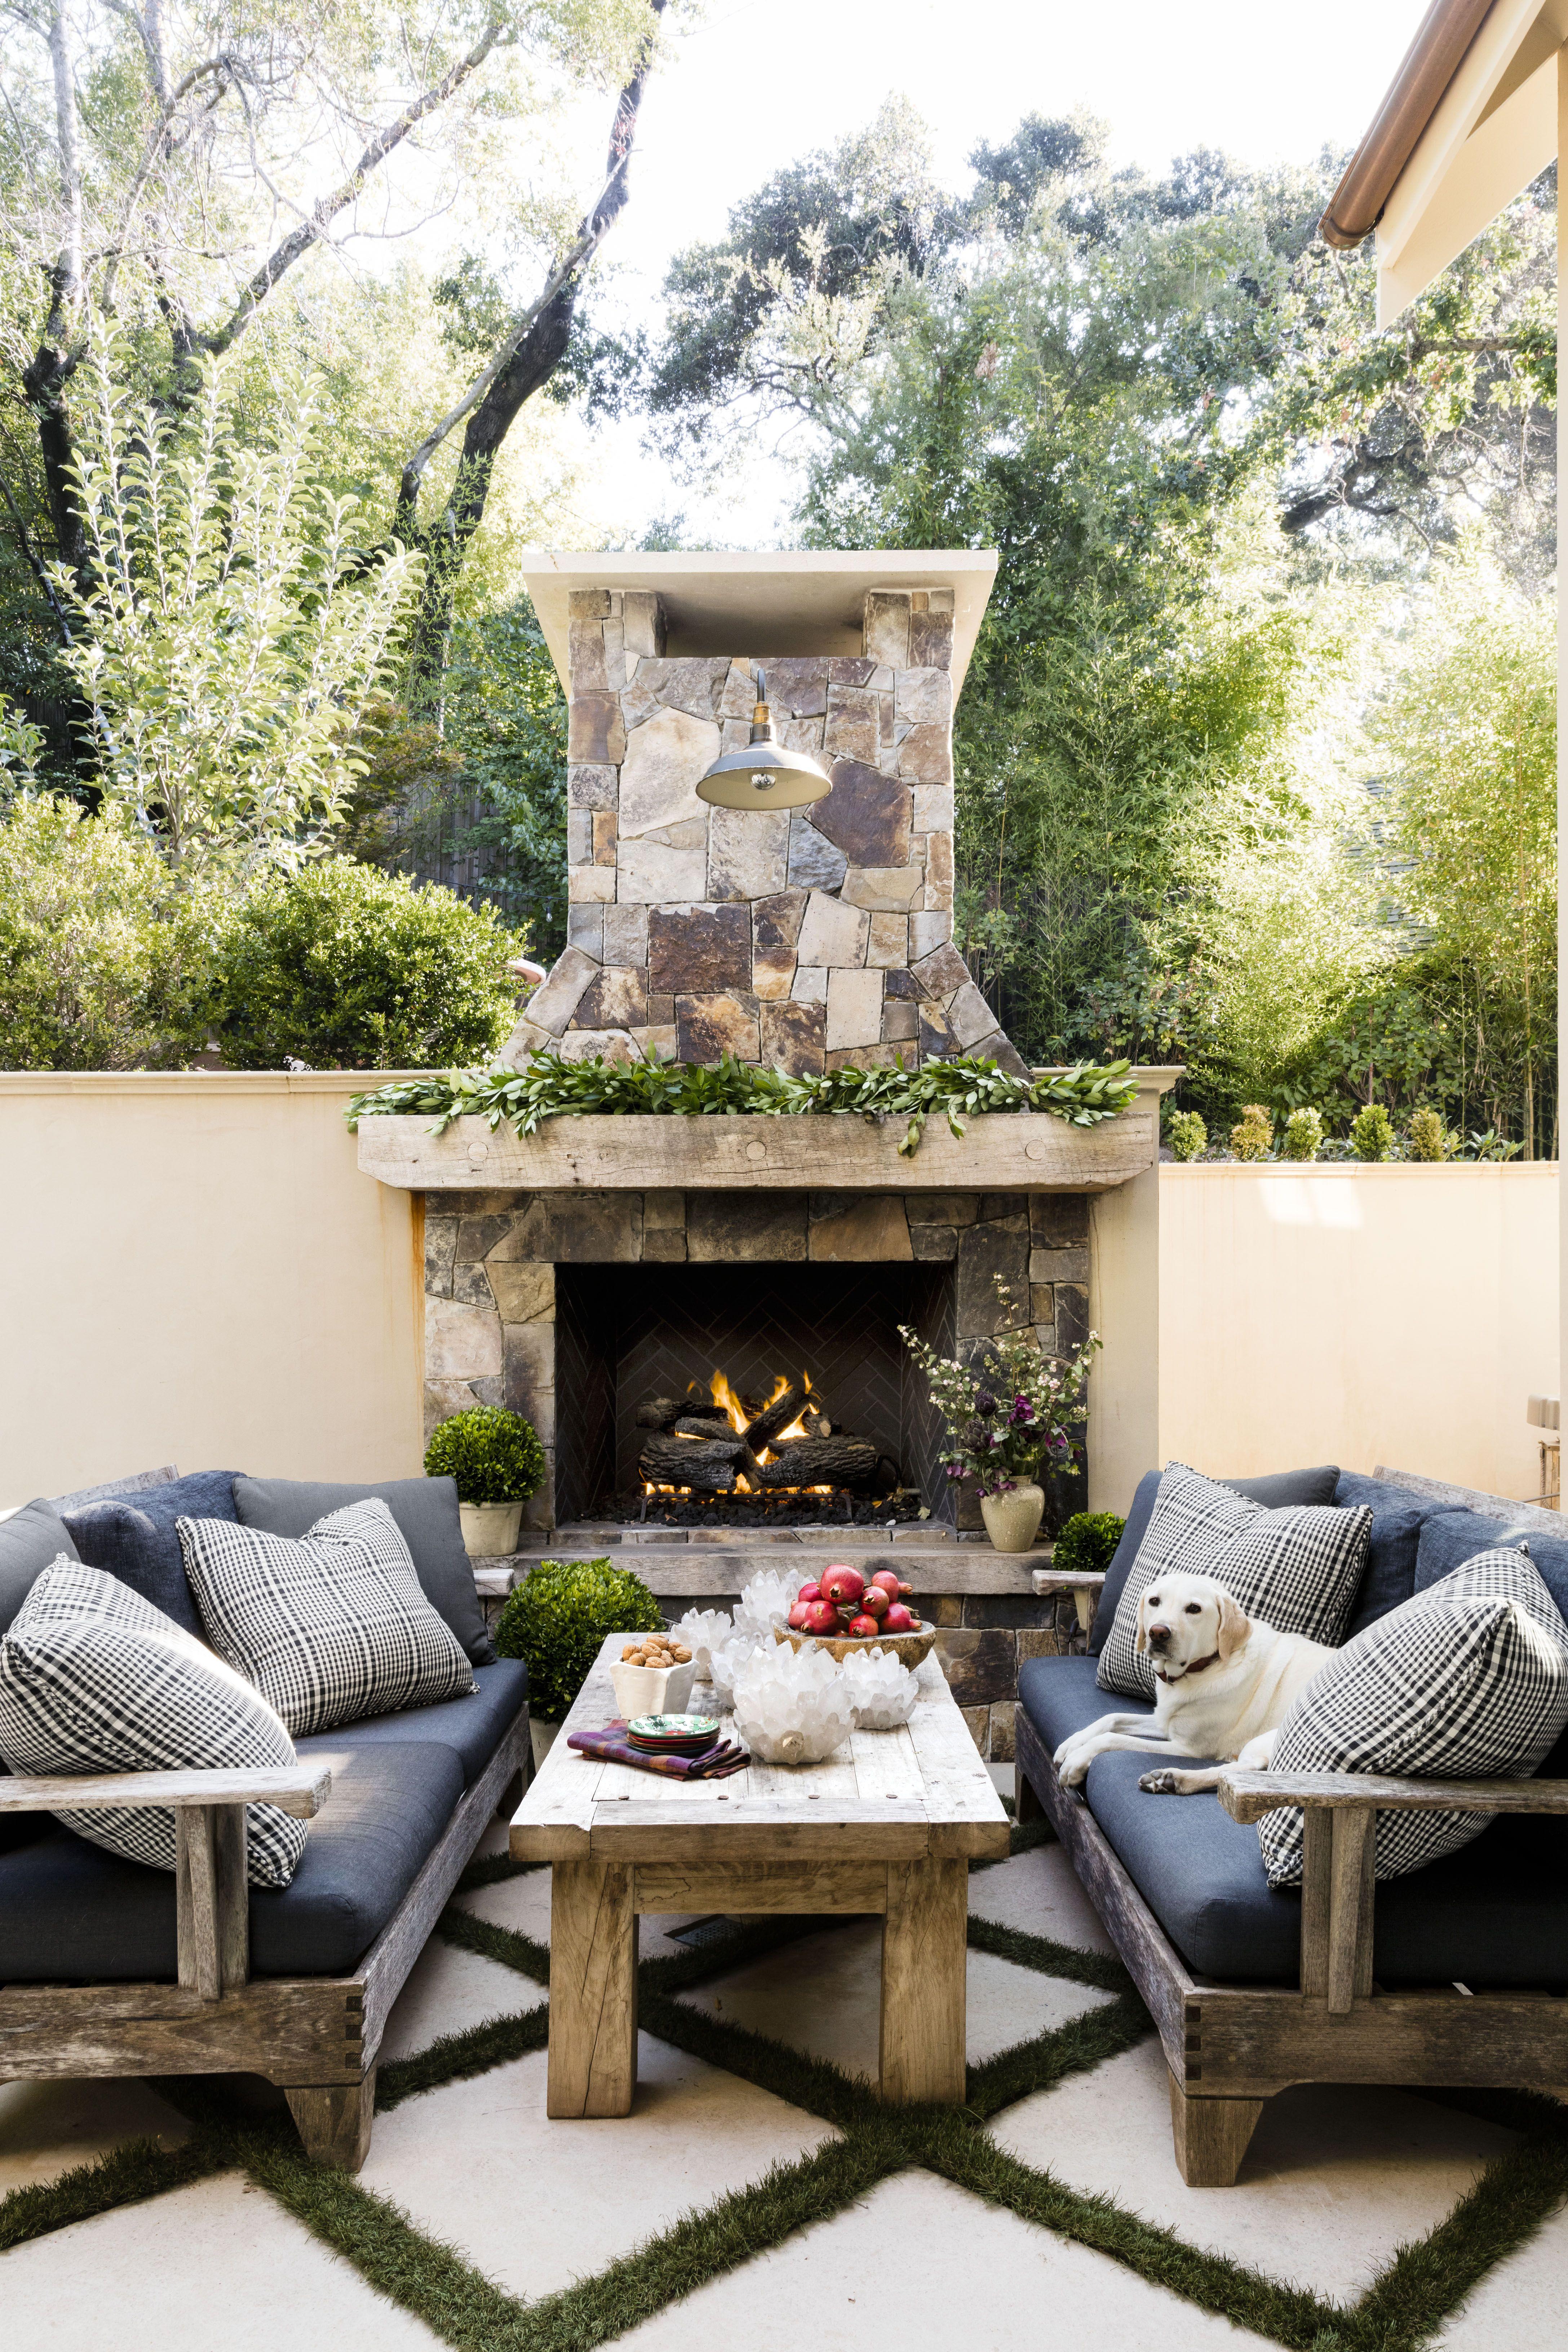 Beau HBX010118_046. Erin Kunkel. Decorate Your Outdoor Fireplace